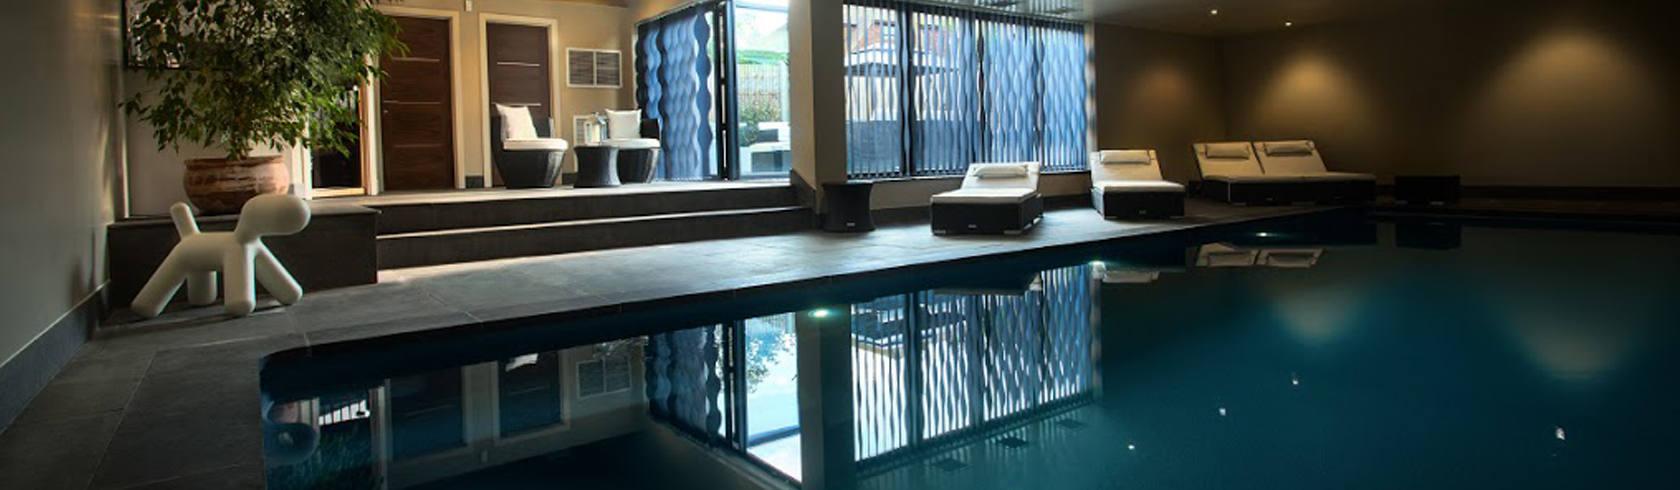 Luxury indoor swimming pool design installation compass pools for Indoor swimming pool building regulations